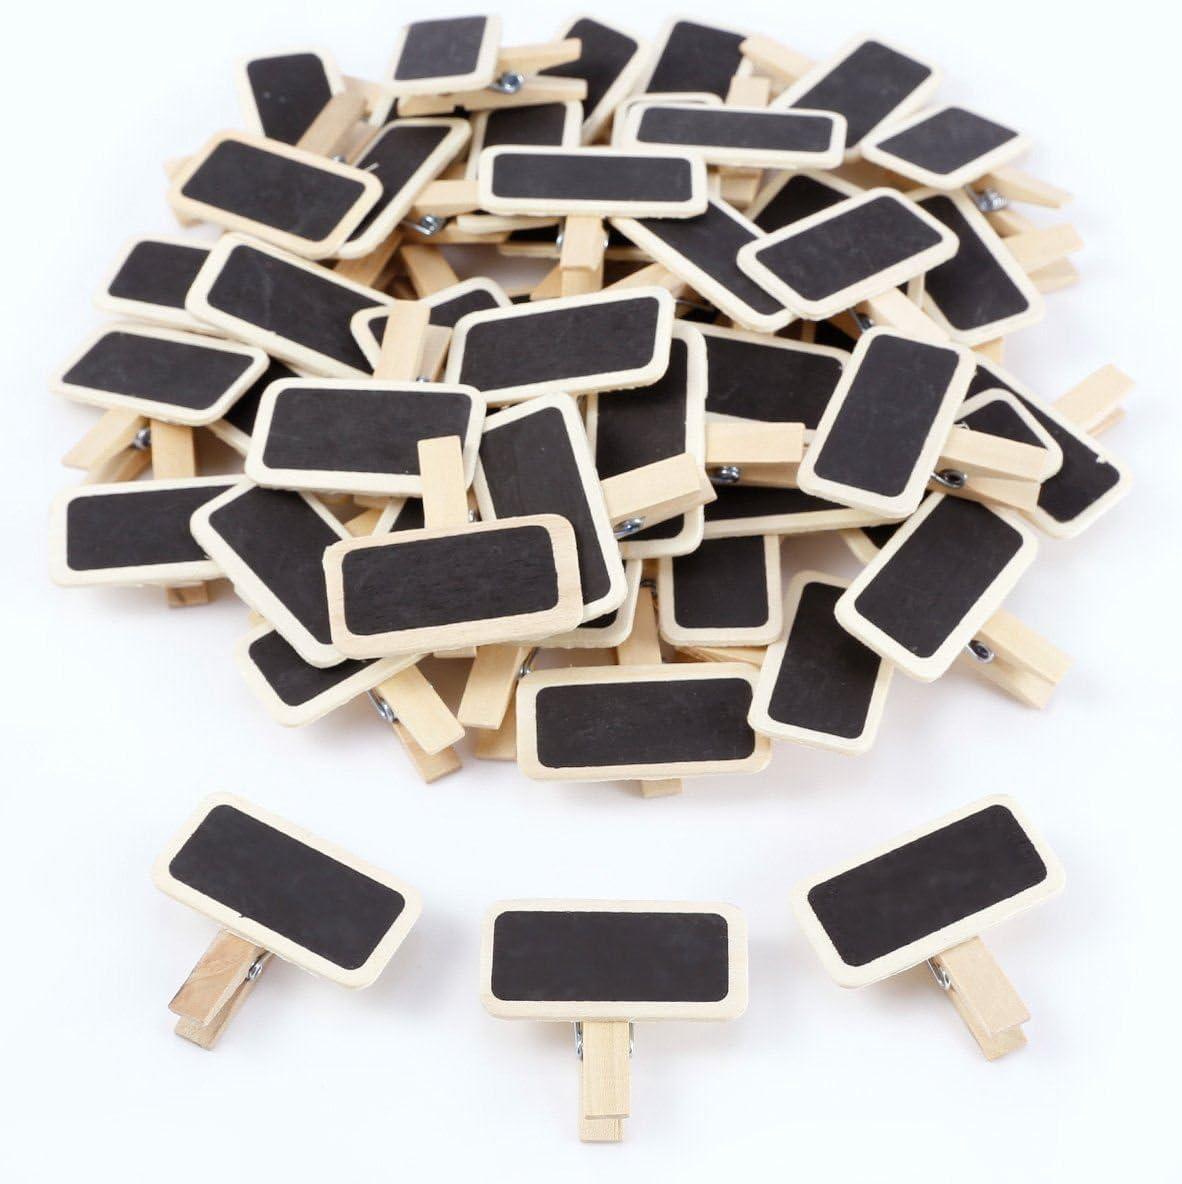 Cikuso 50 Mini pizarra Pizarra rectangular de mensaje de madera panel de tarjeta de clip etiqueta memos marca de precio tabla de numeros de lugar